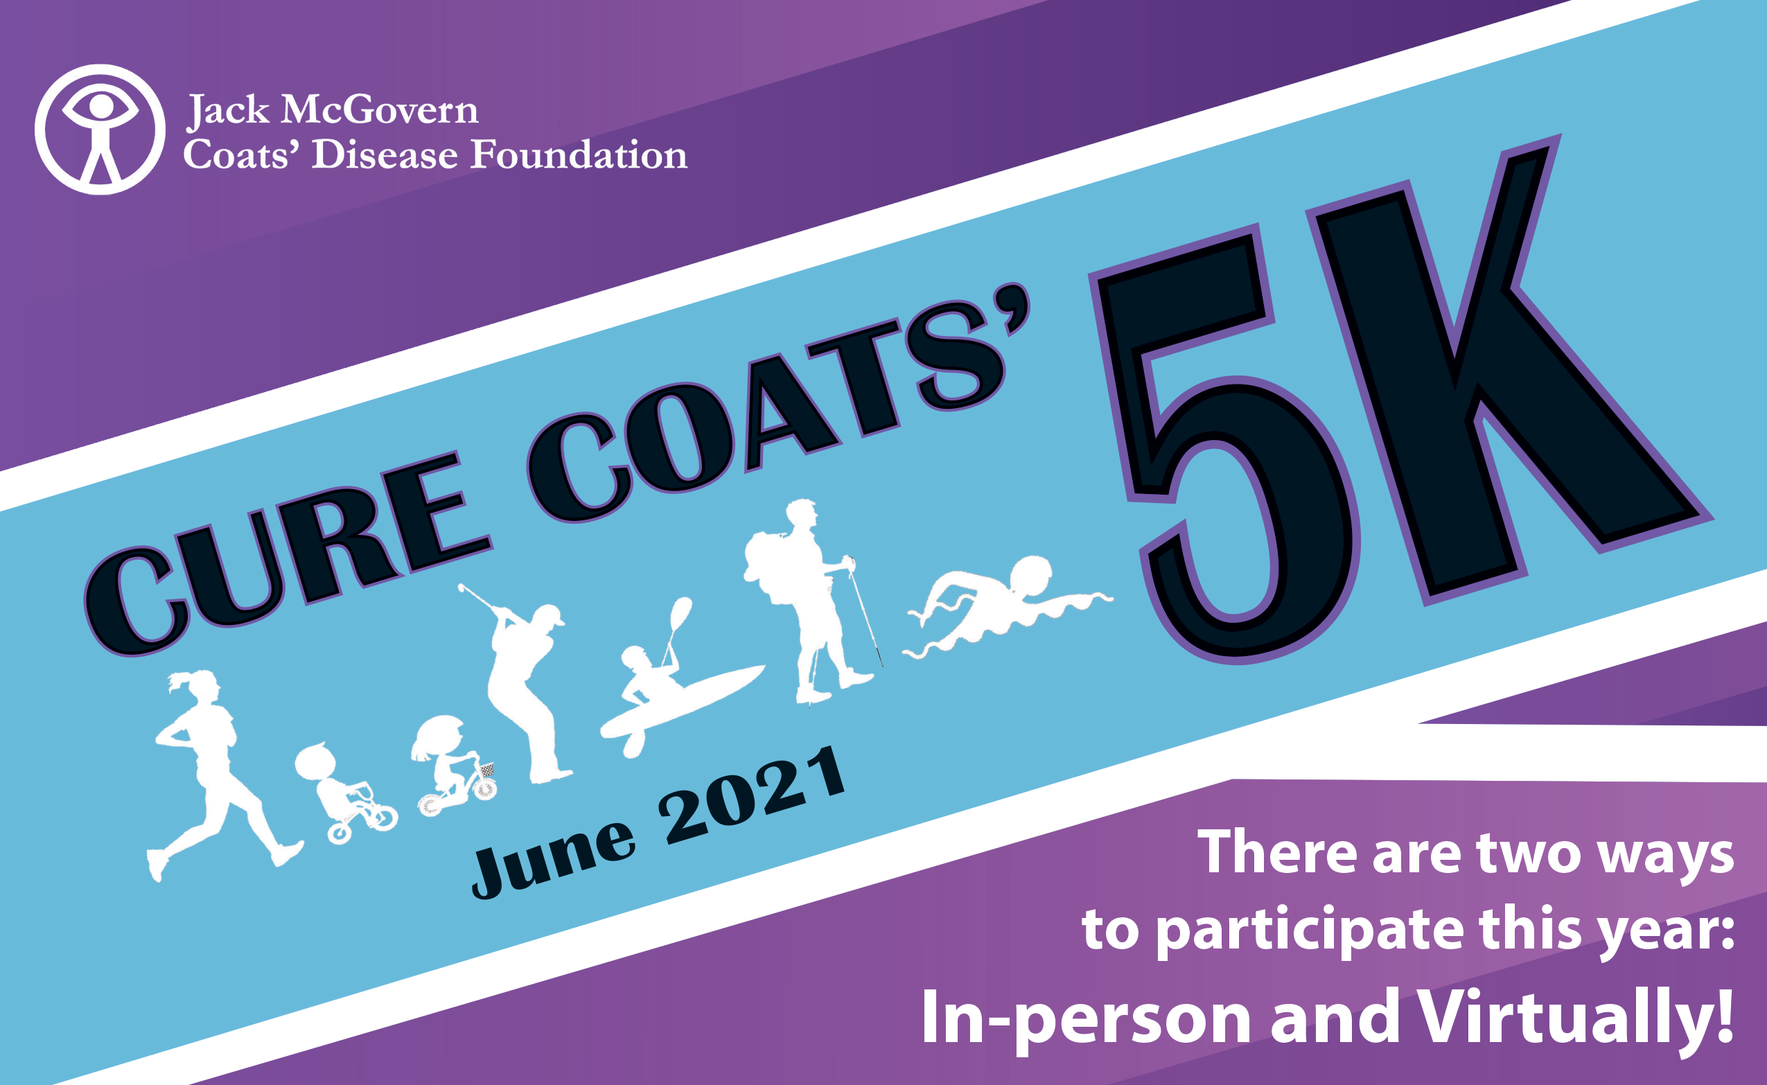 2021 Cure Coats' 5K image